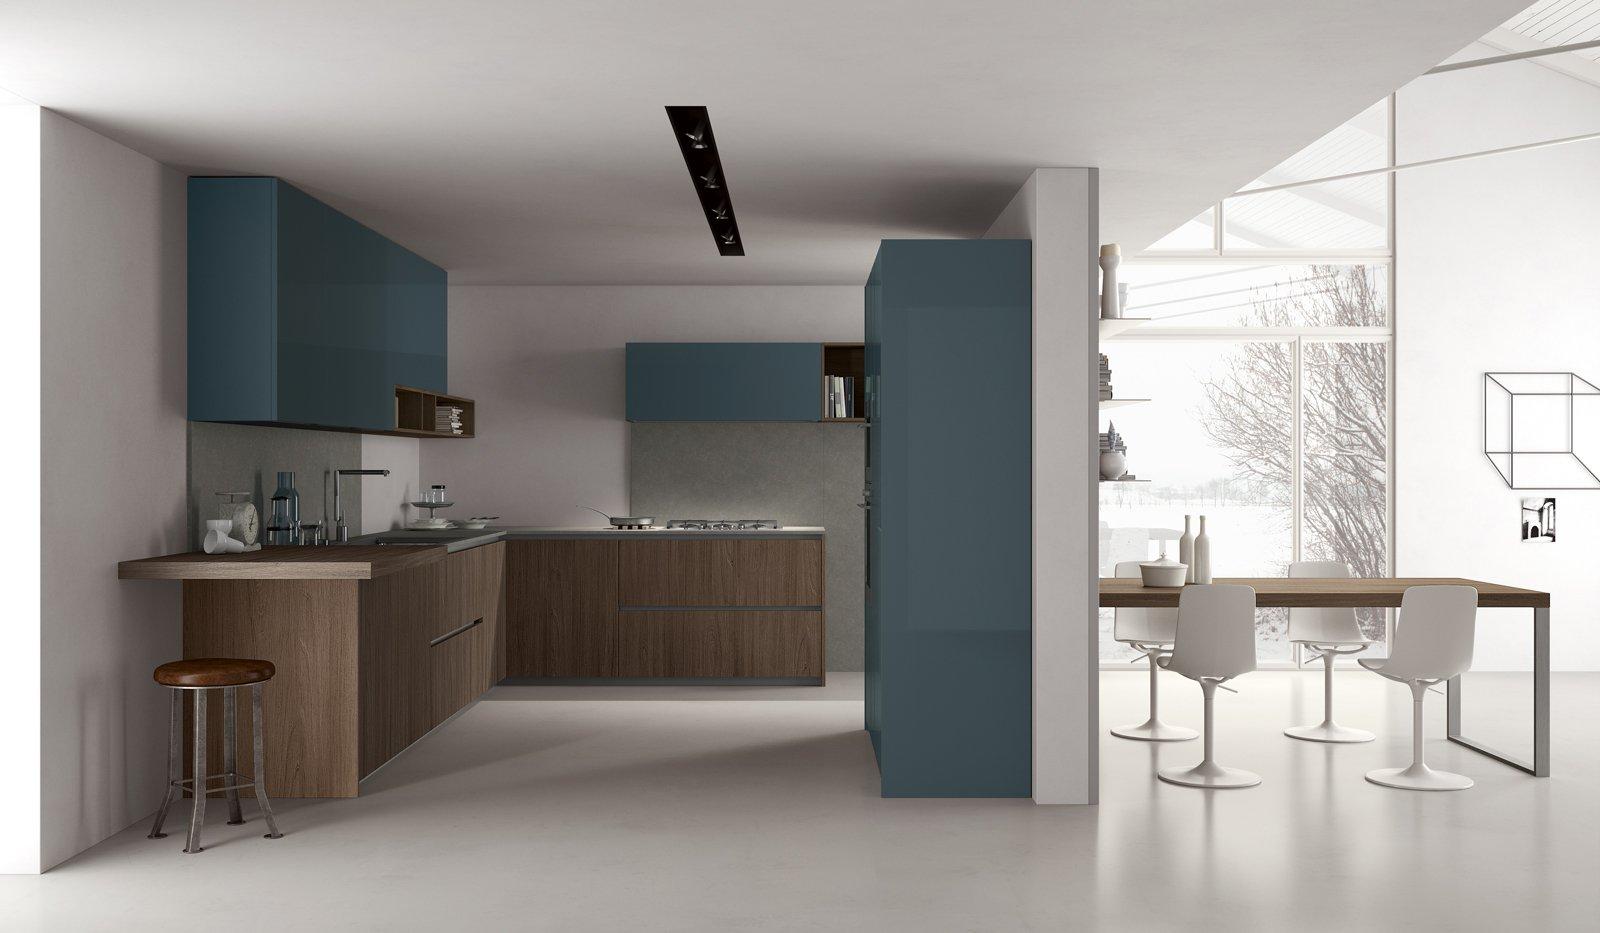 Cucine bicolore l 39 alternanza cromatica fa tendenza cose di casa - Cucina bianca e marrone ...